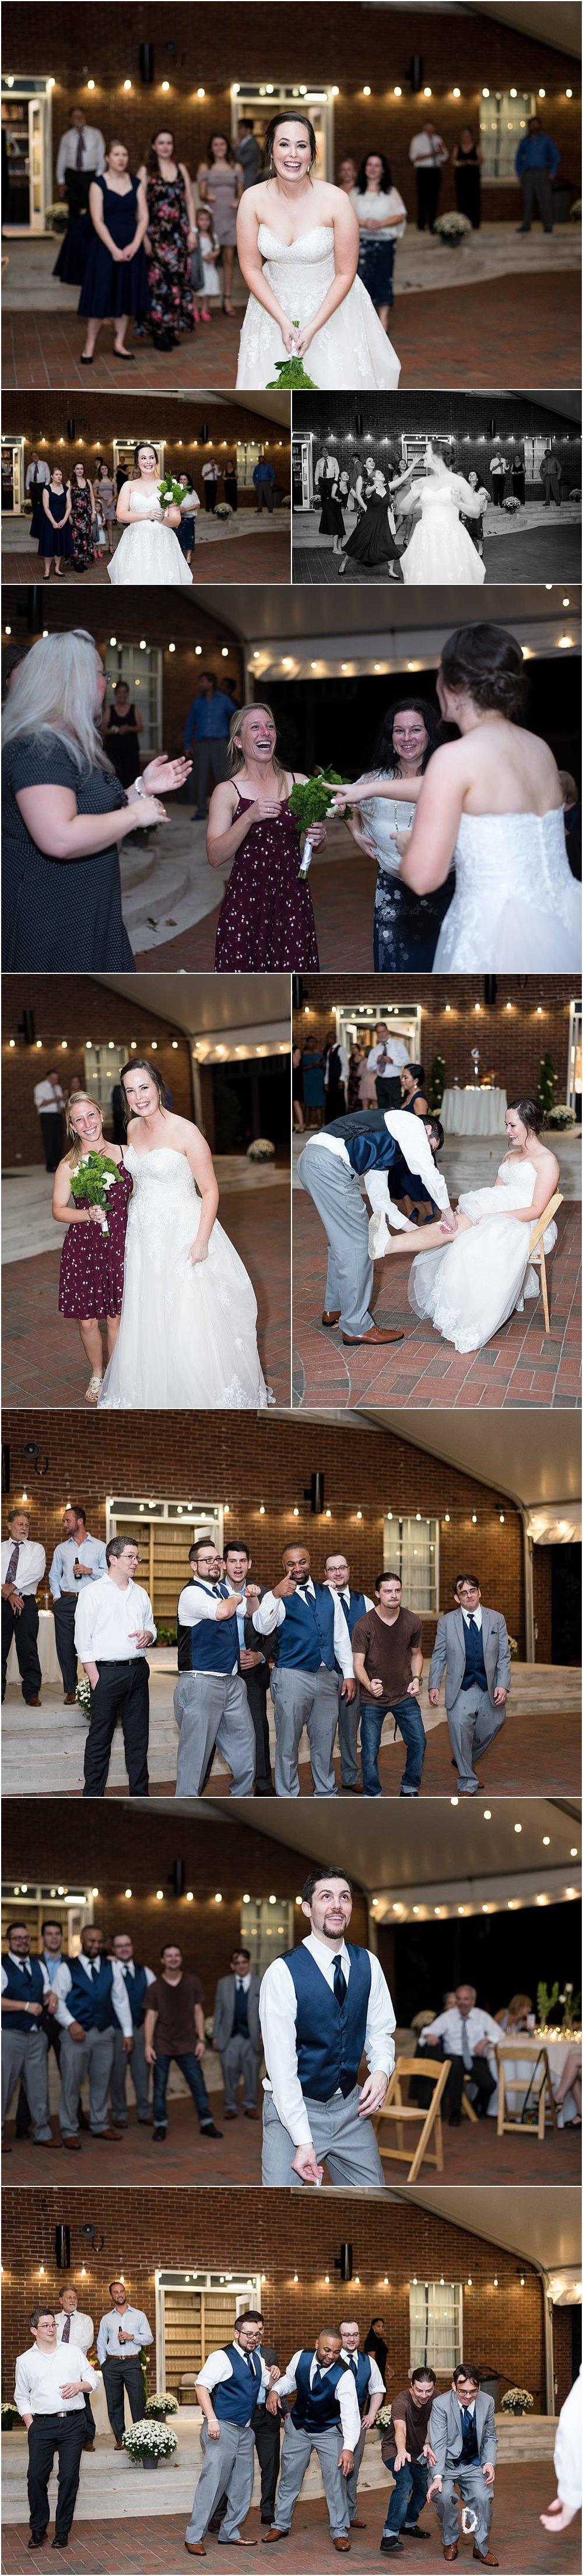 Nolan-And-Leanna-Vanderbilt-Dyer-Observatory-Wedding-in-Brentwood-TN-Nashville-Wedding-Photographers+2